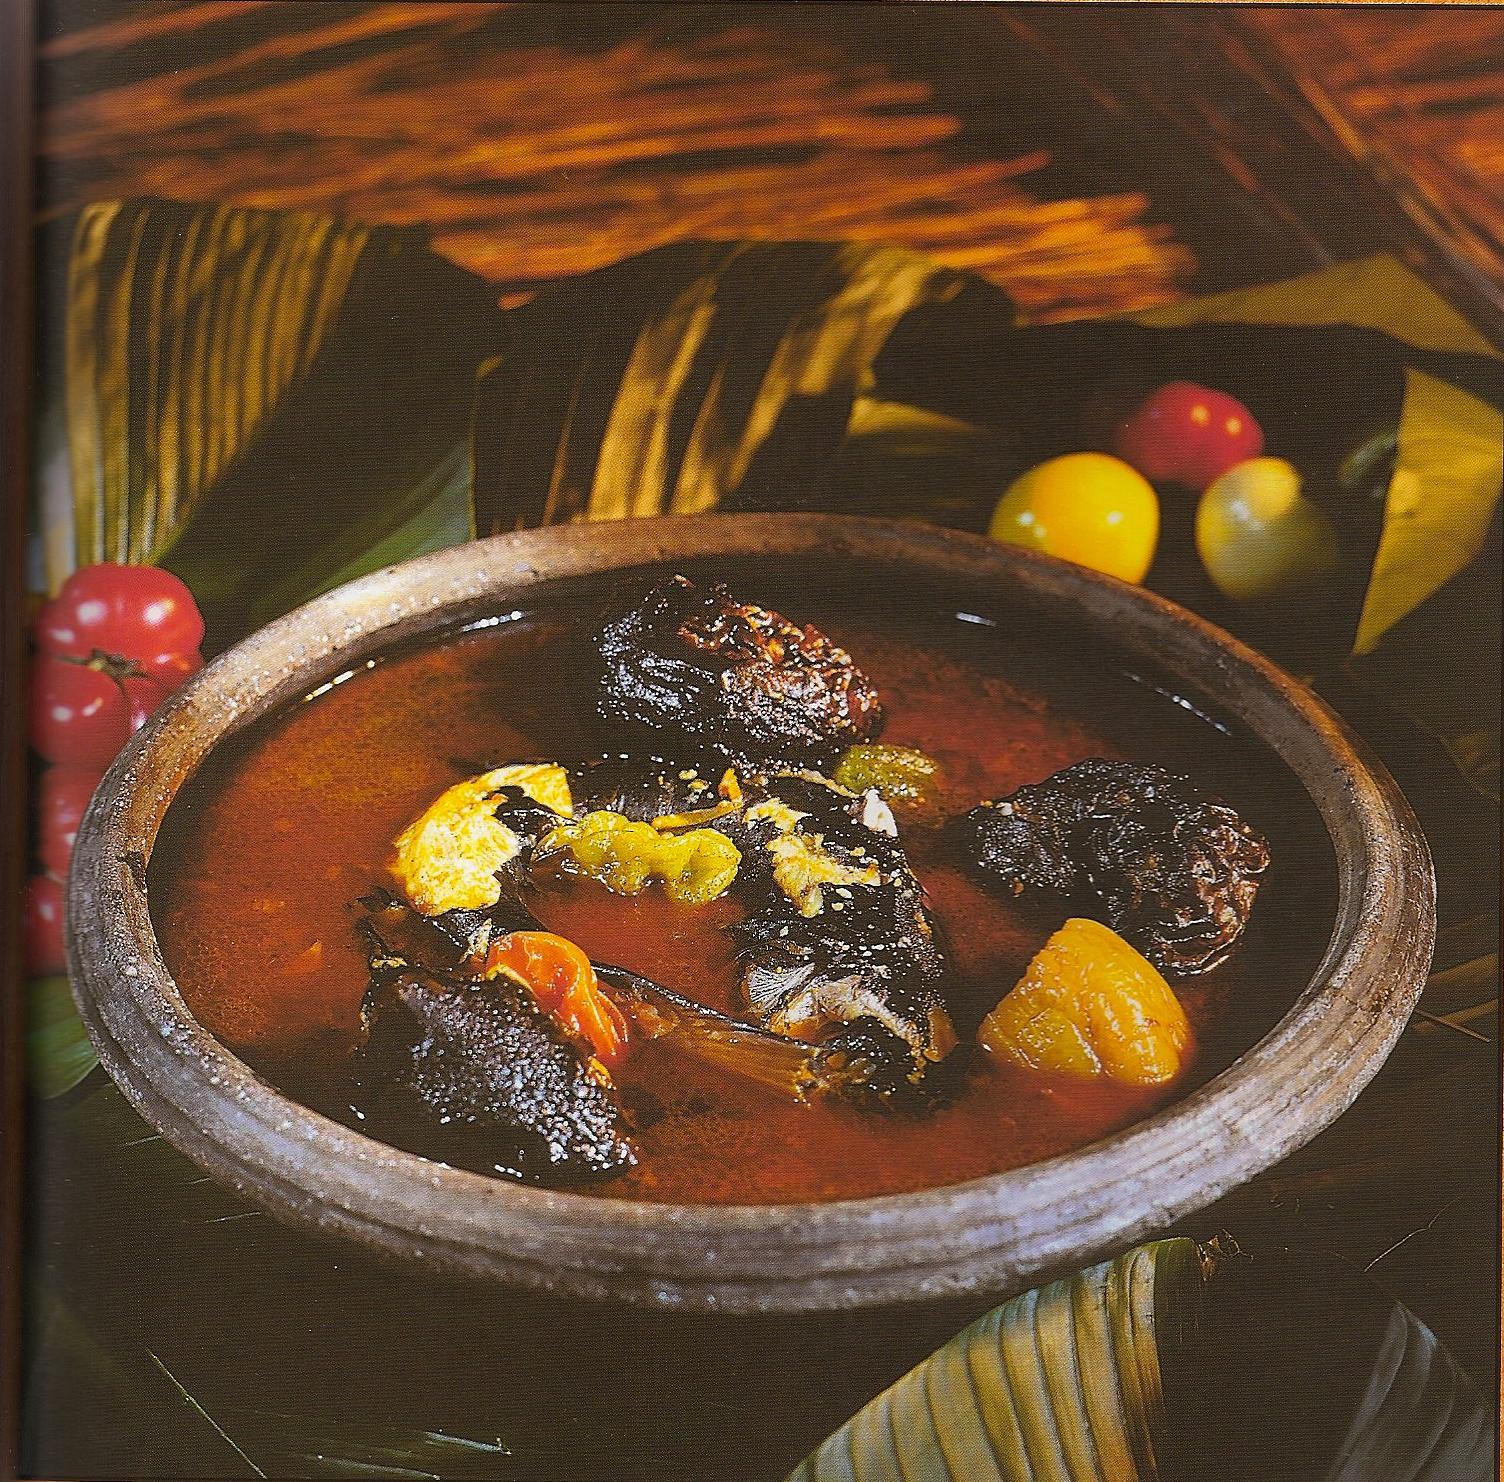 Cuisine ivoirienne sauce claire for Abidjan net cuisine ivoirienne